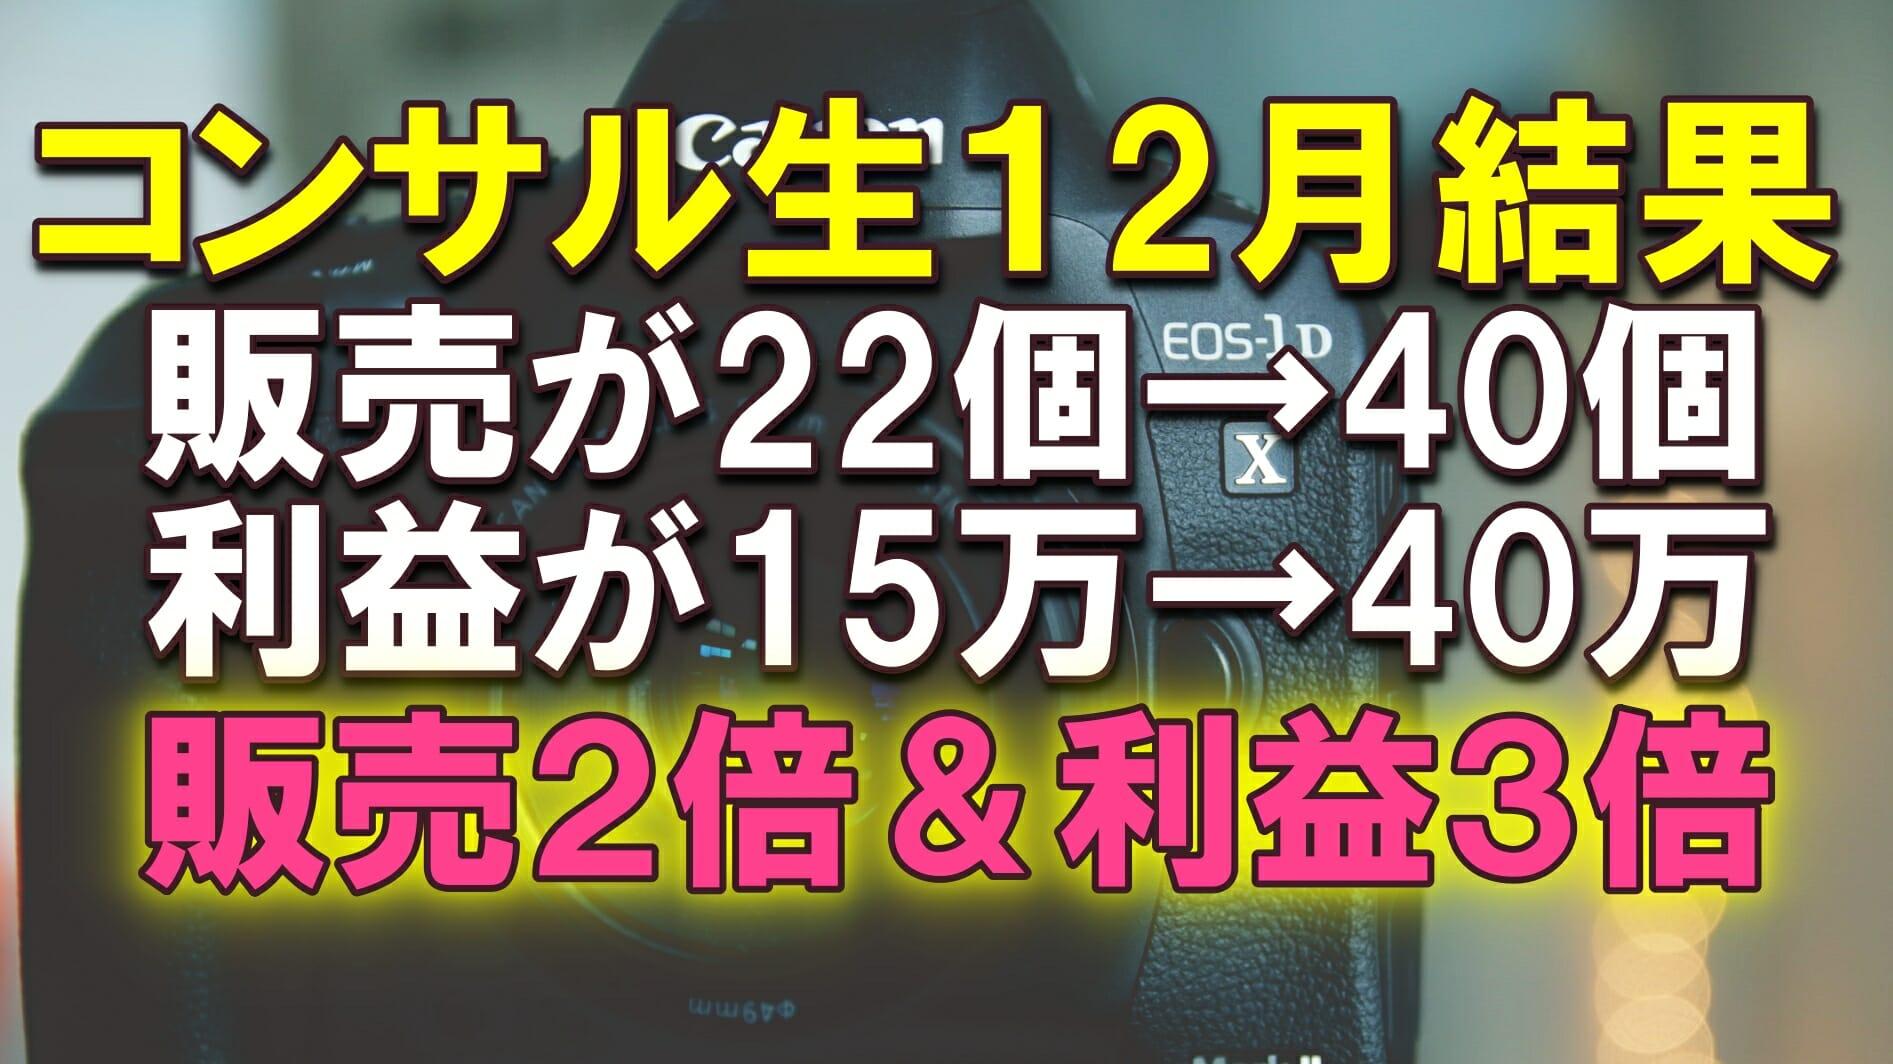 【ebay カメラ初心者も毎日売れる】12月のコンサル生の結果。1ヶ月で販売個数2倍&利益は3倍の40万円に